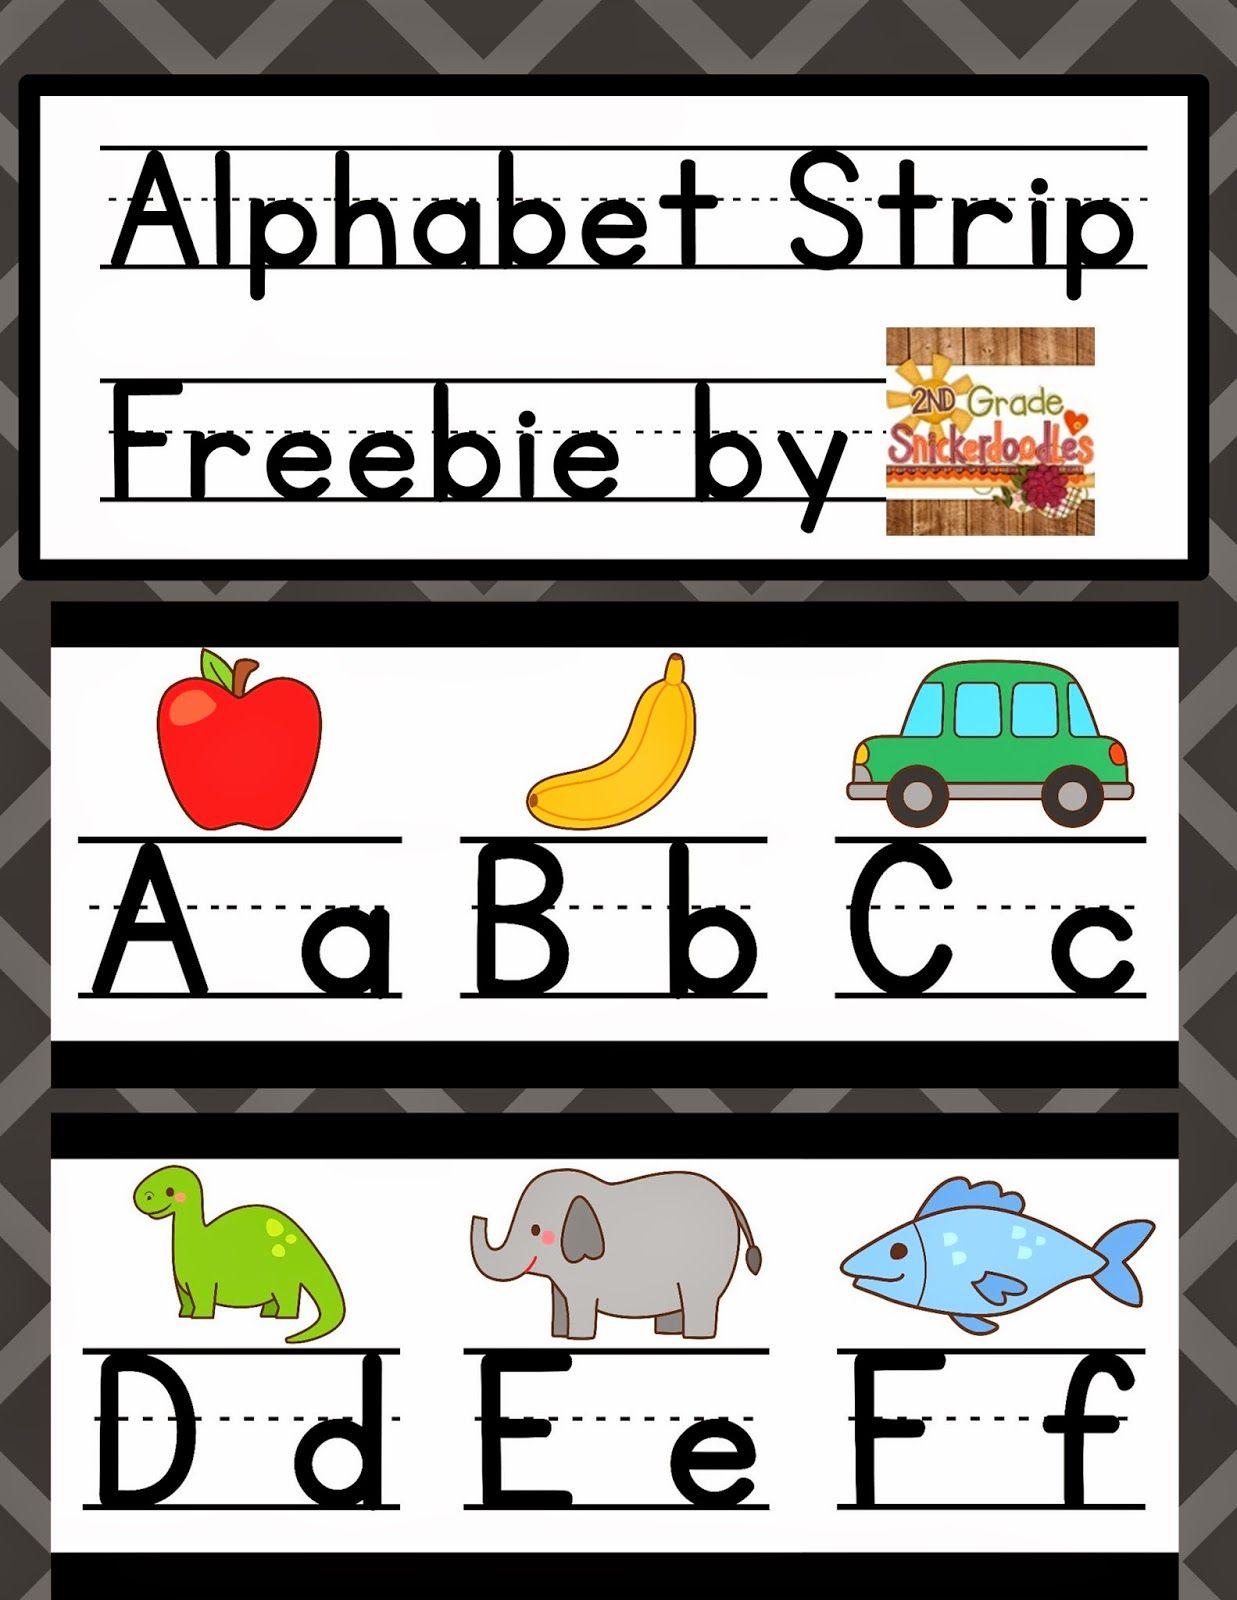 2nd Grade Snickerdoodles Alphabet Strip Posters Freebie